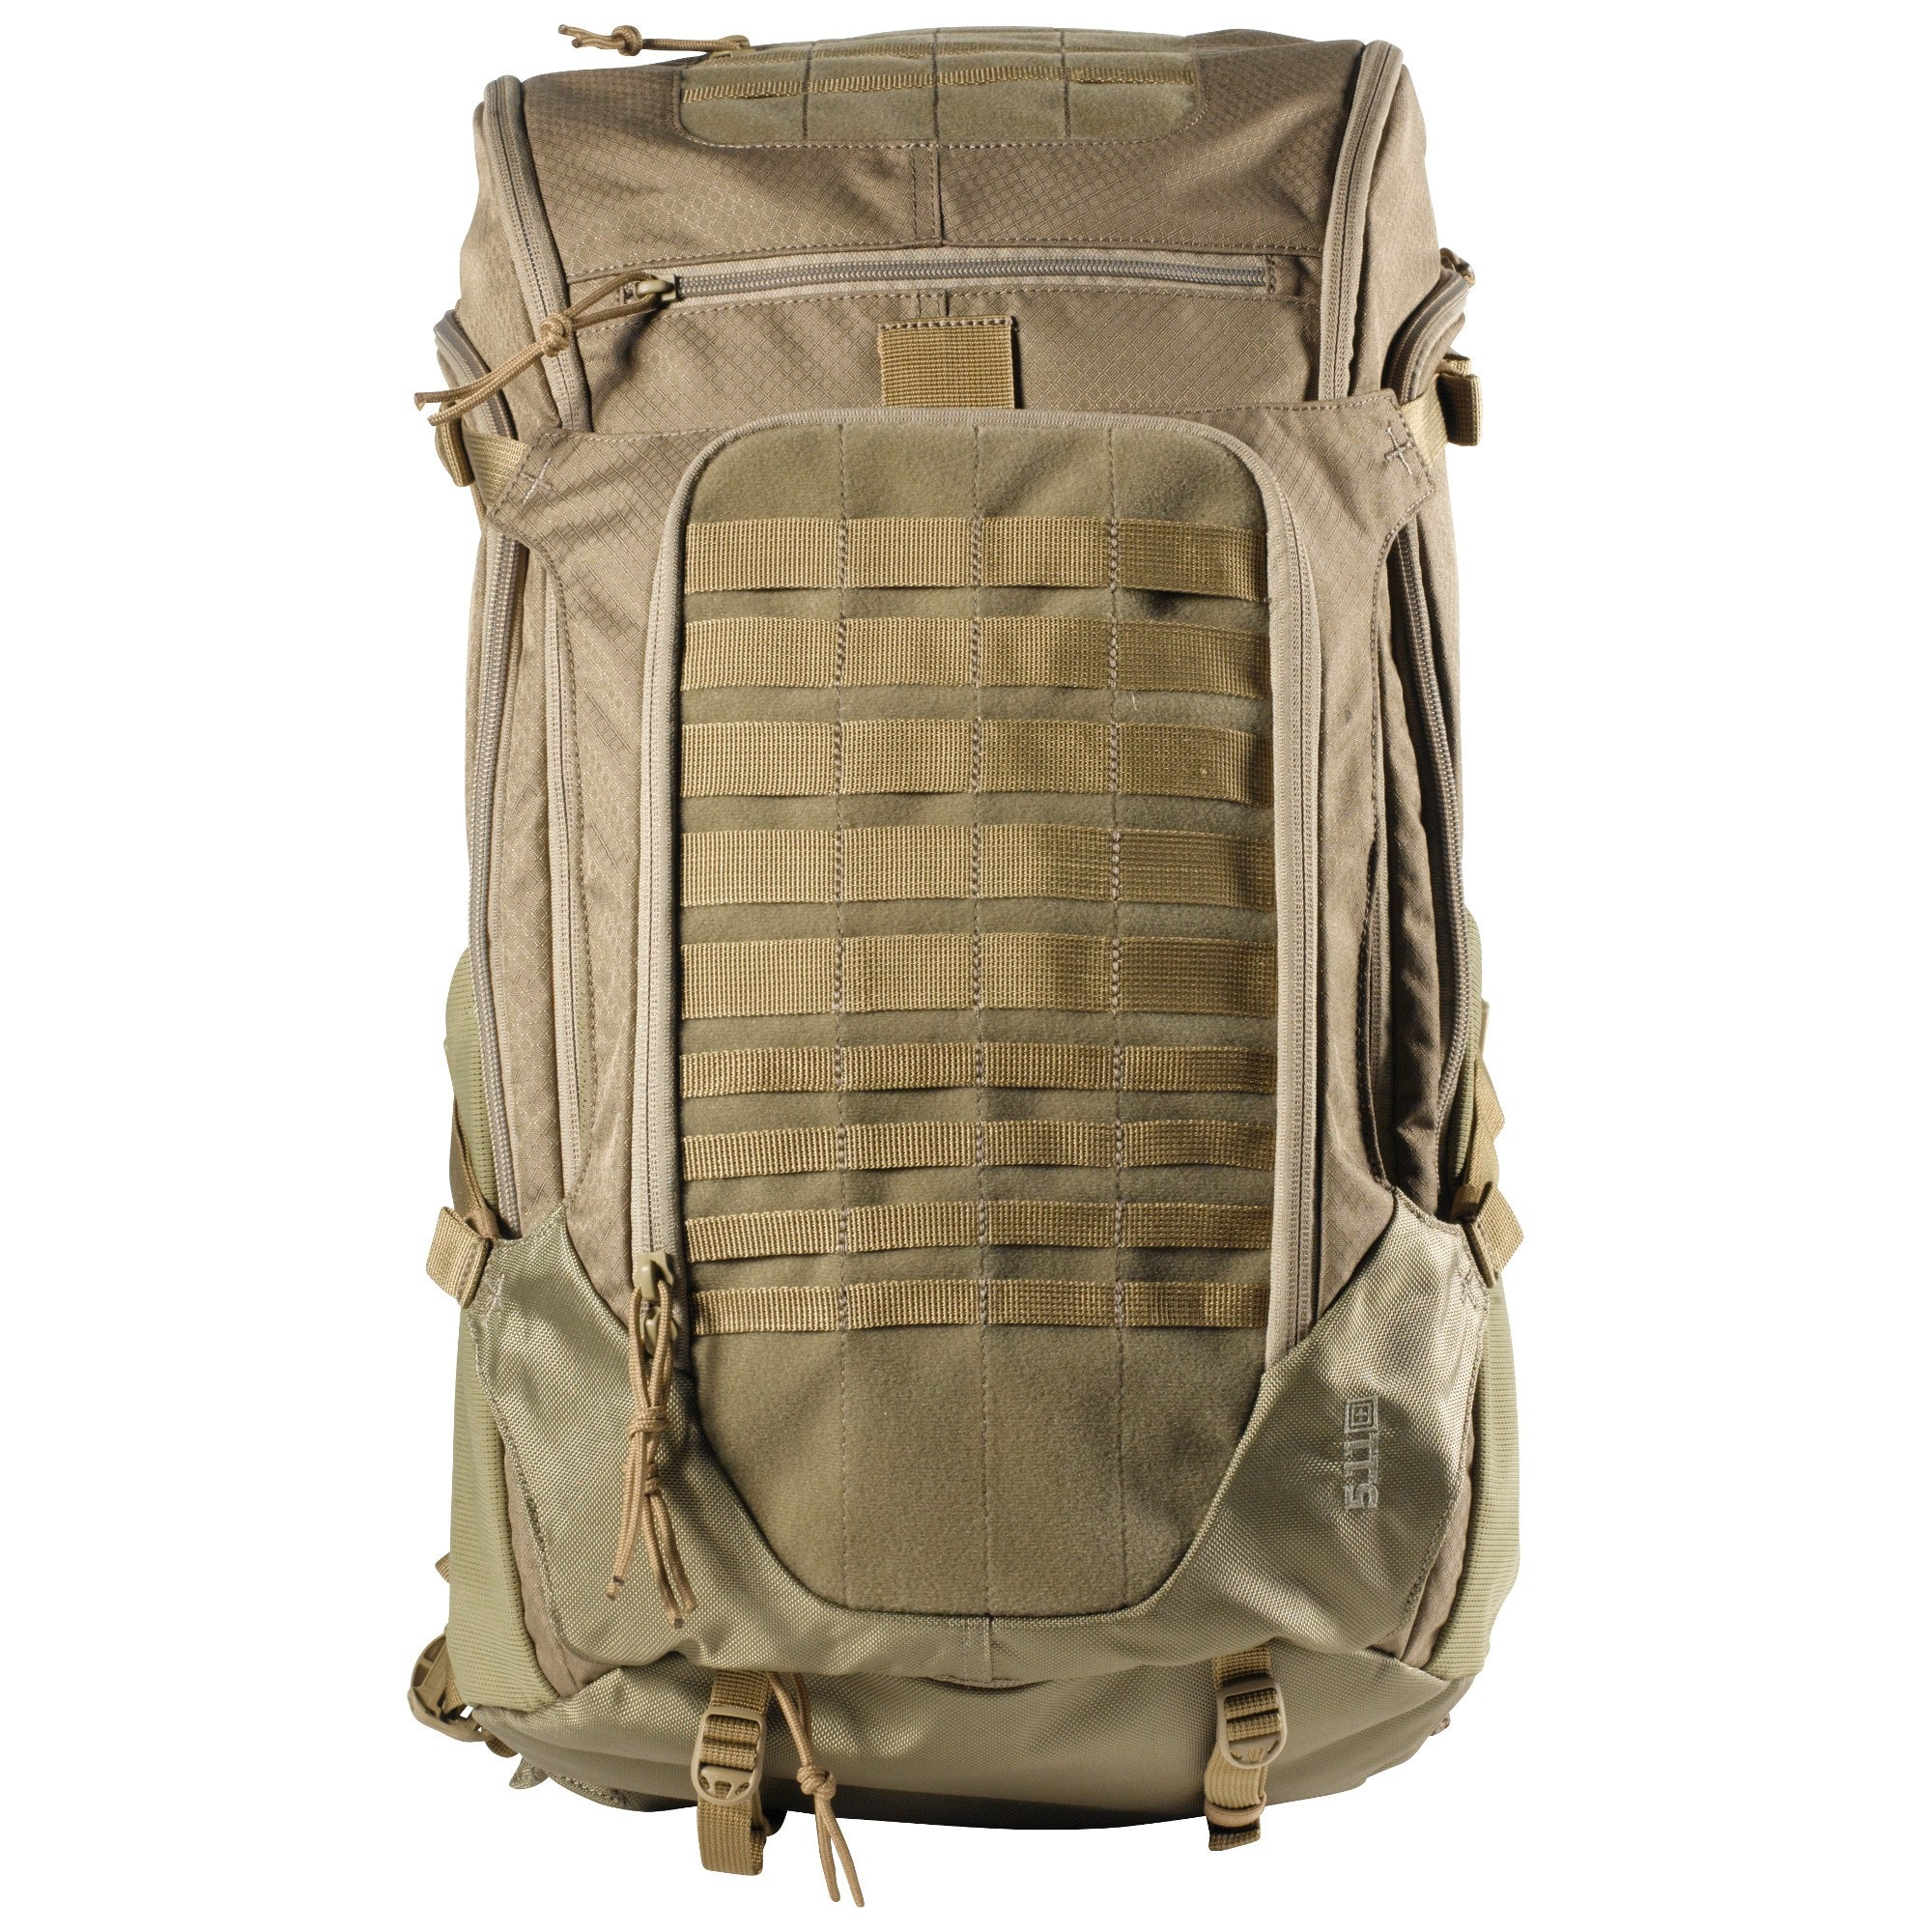 Ignitor Backpack - Bags & Packs